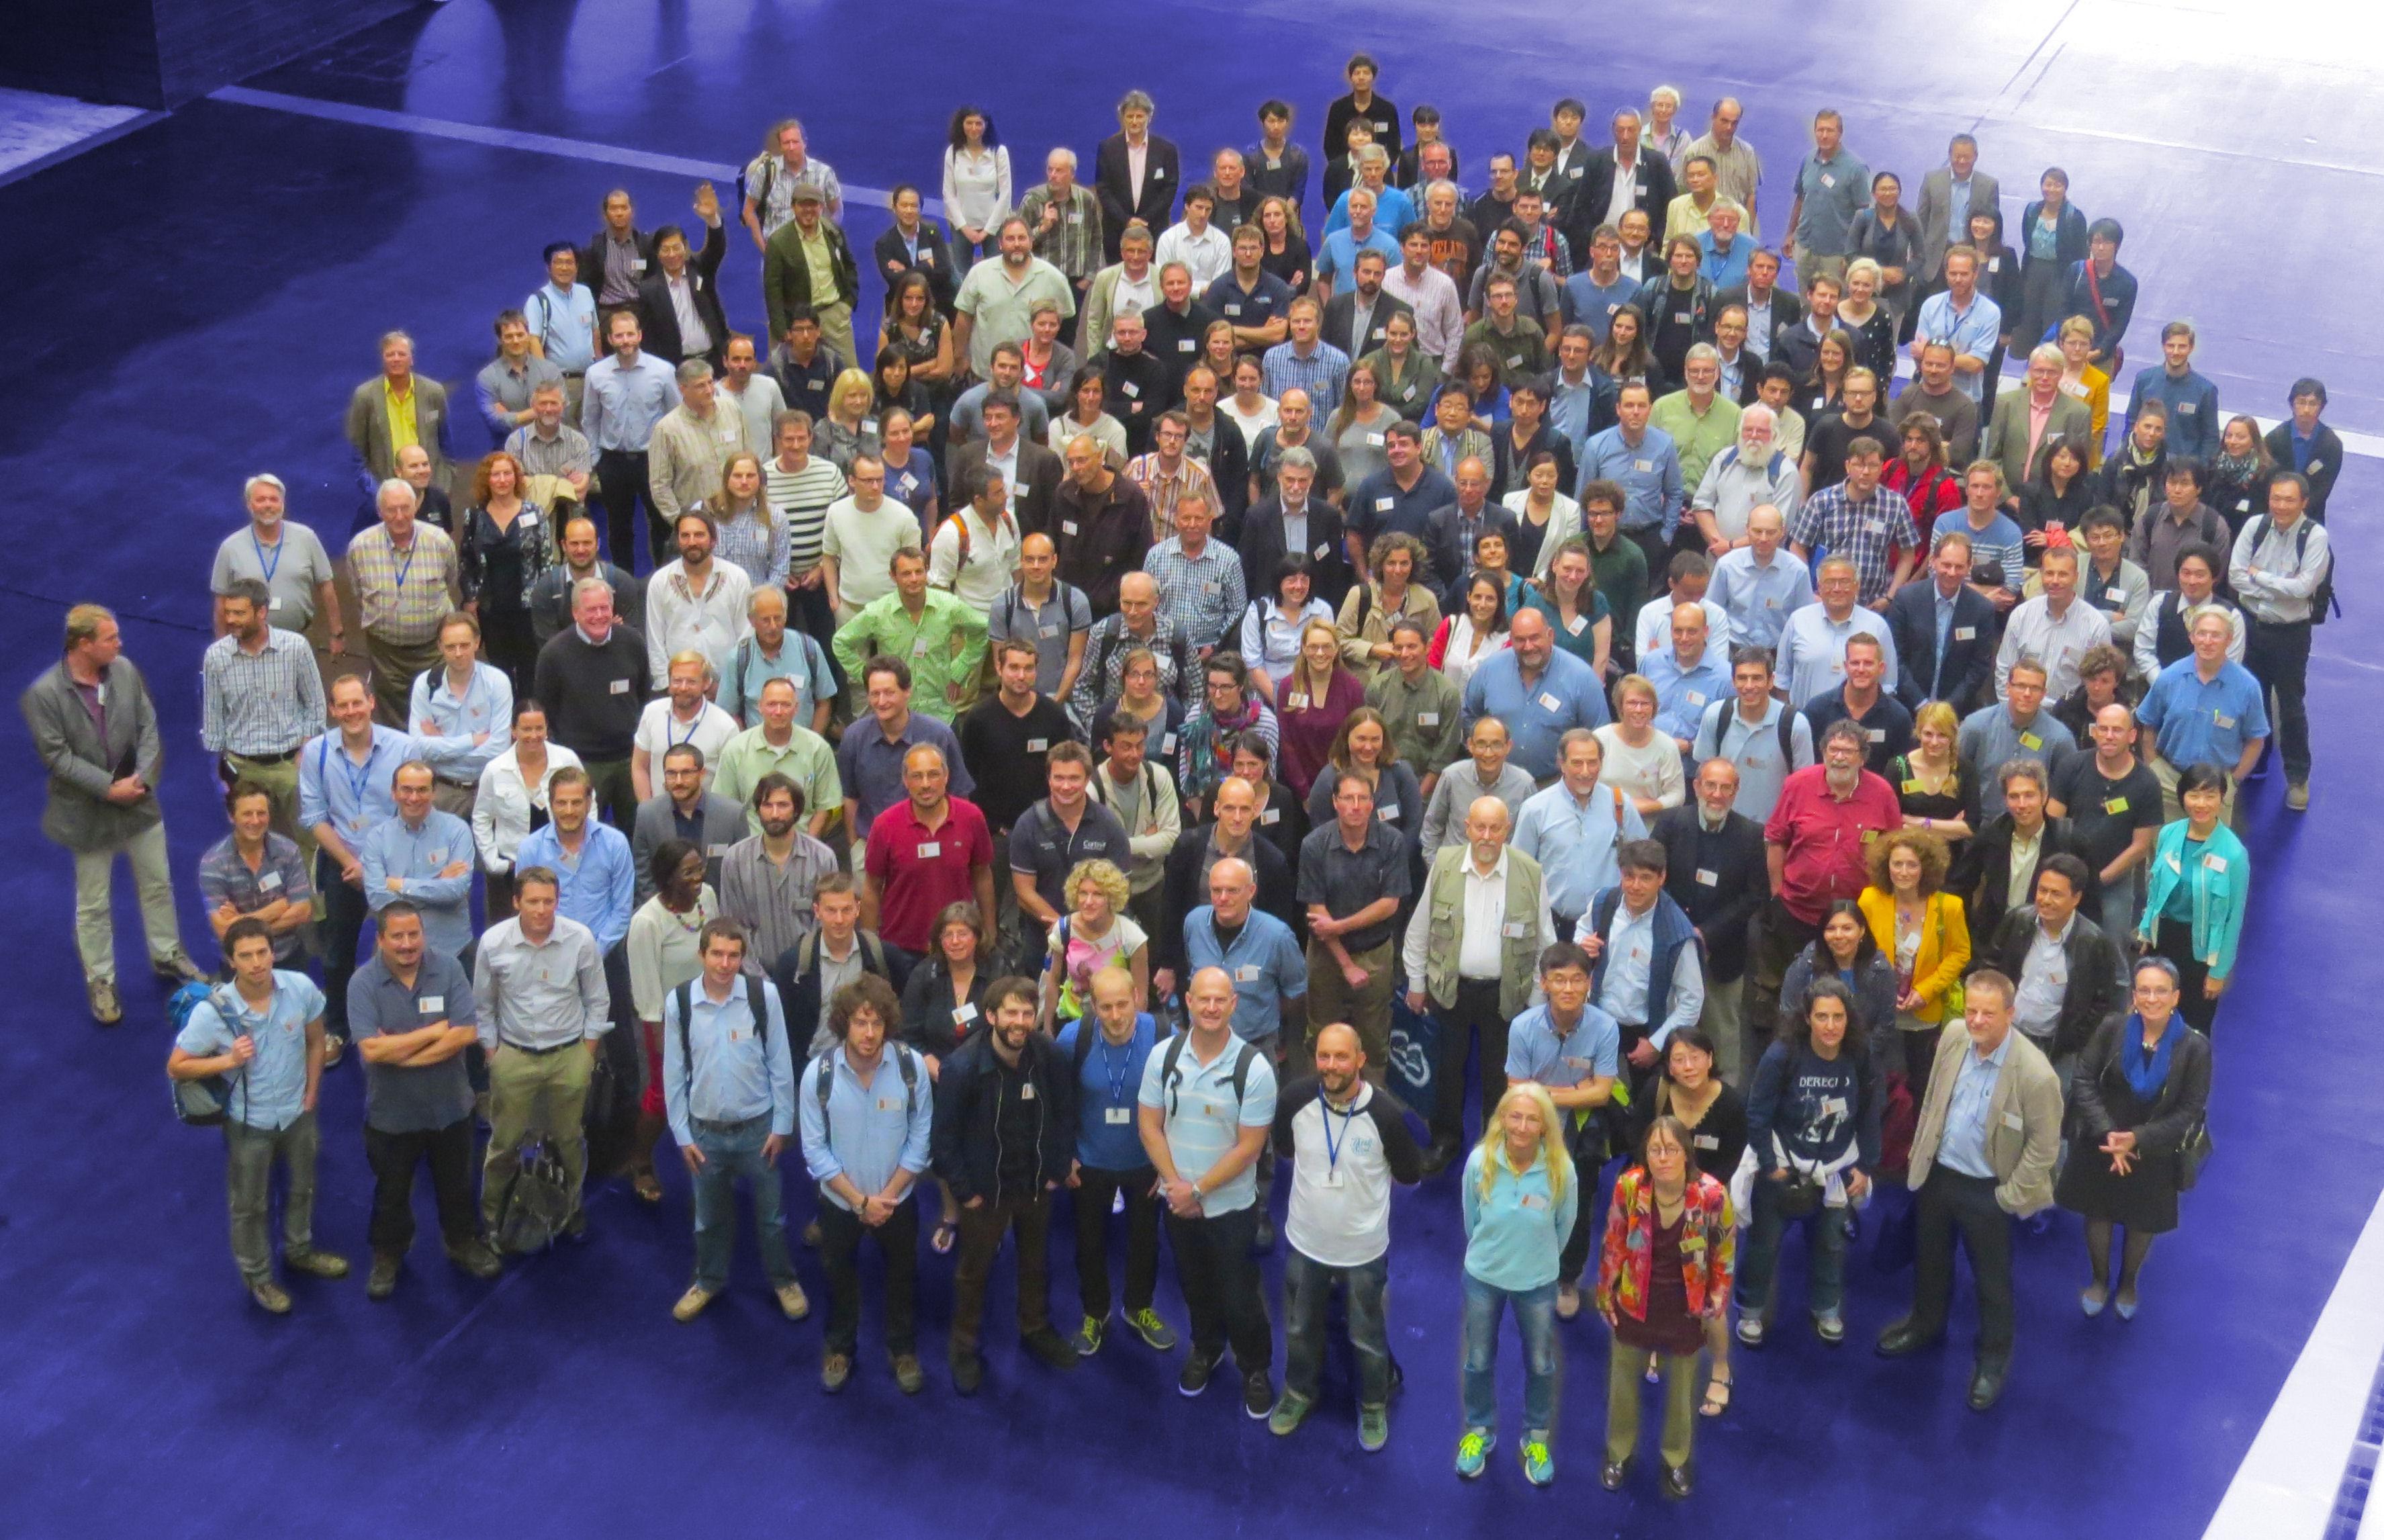 GroupPhotoICESAcousticSymposium2015red.jpg